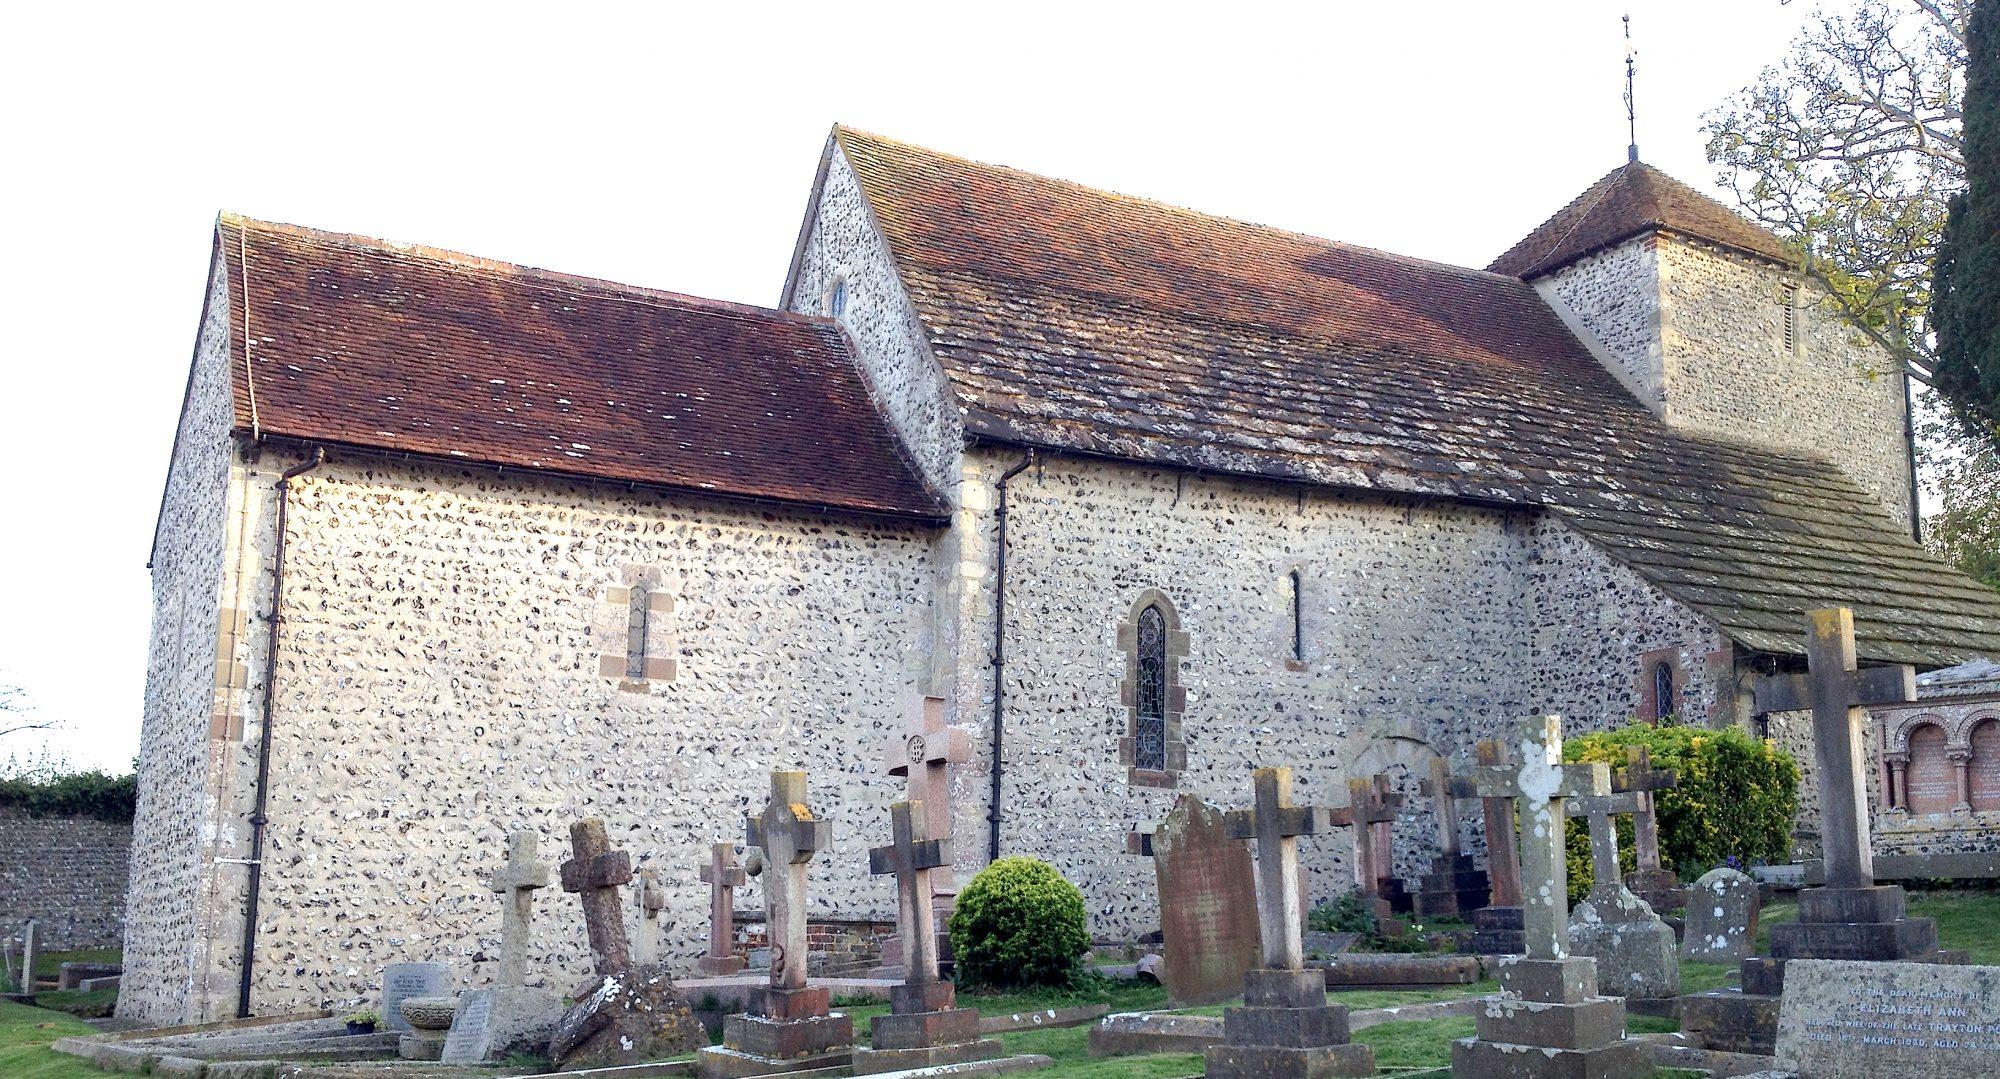 St Wulfran's